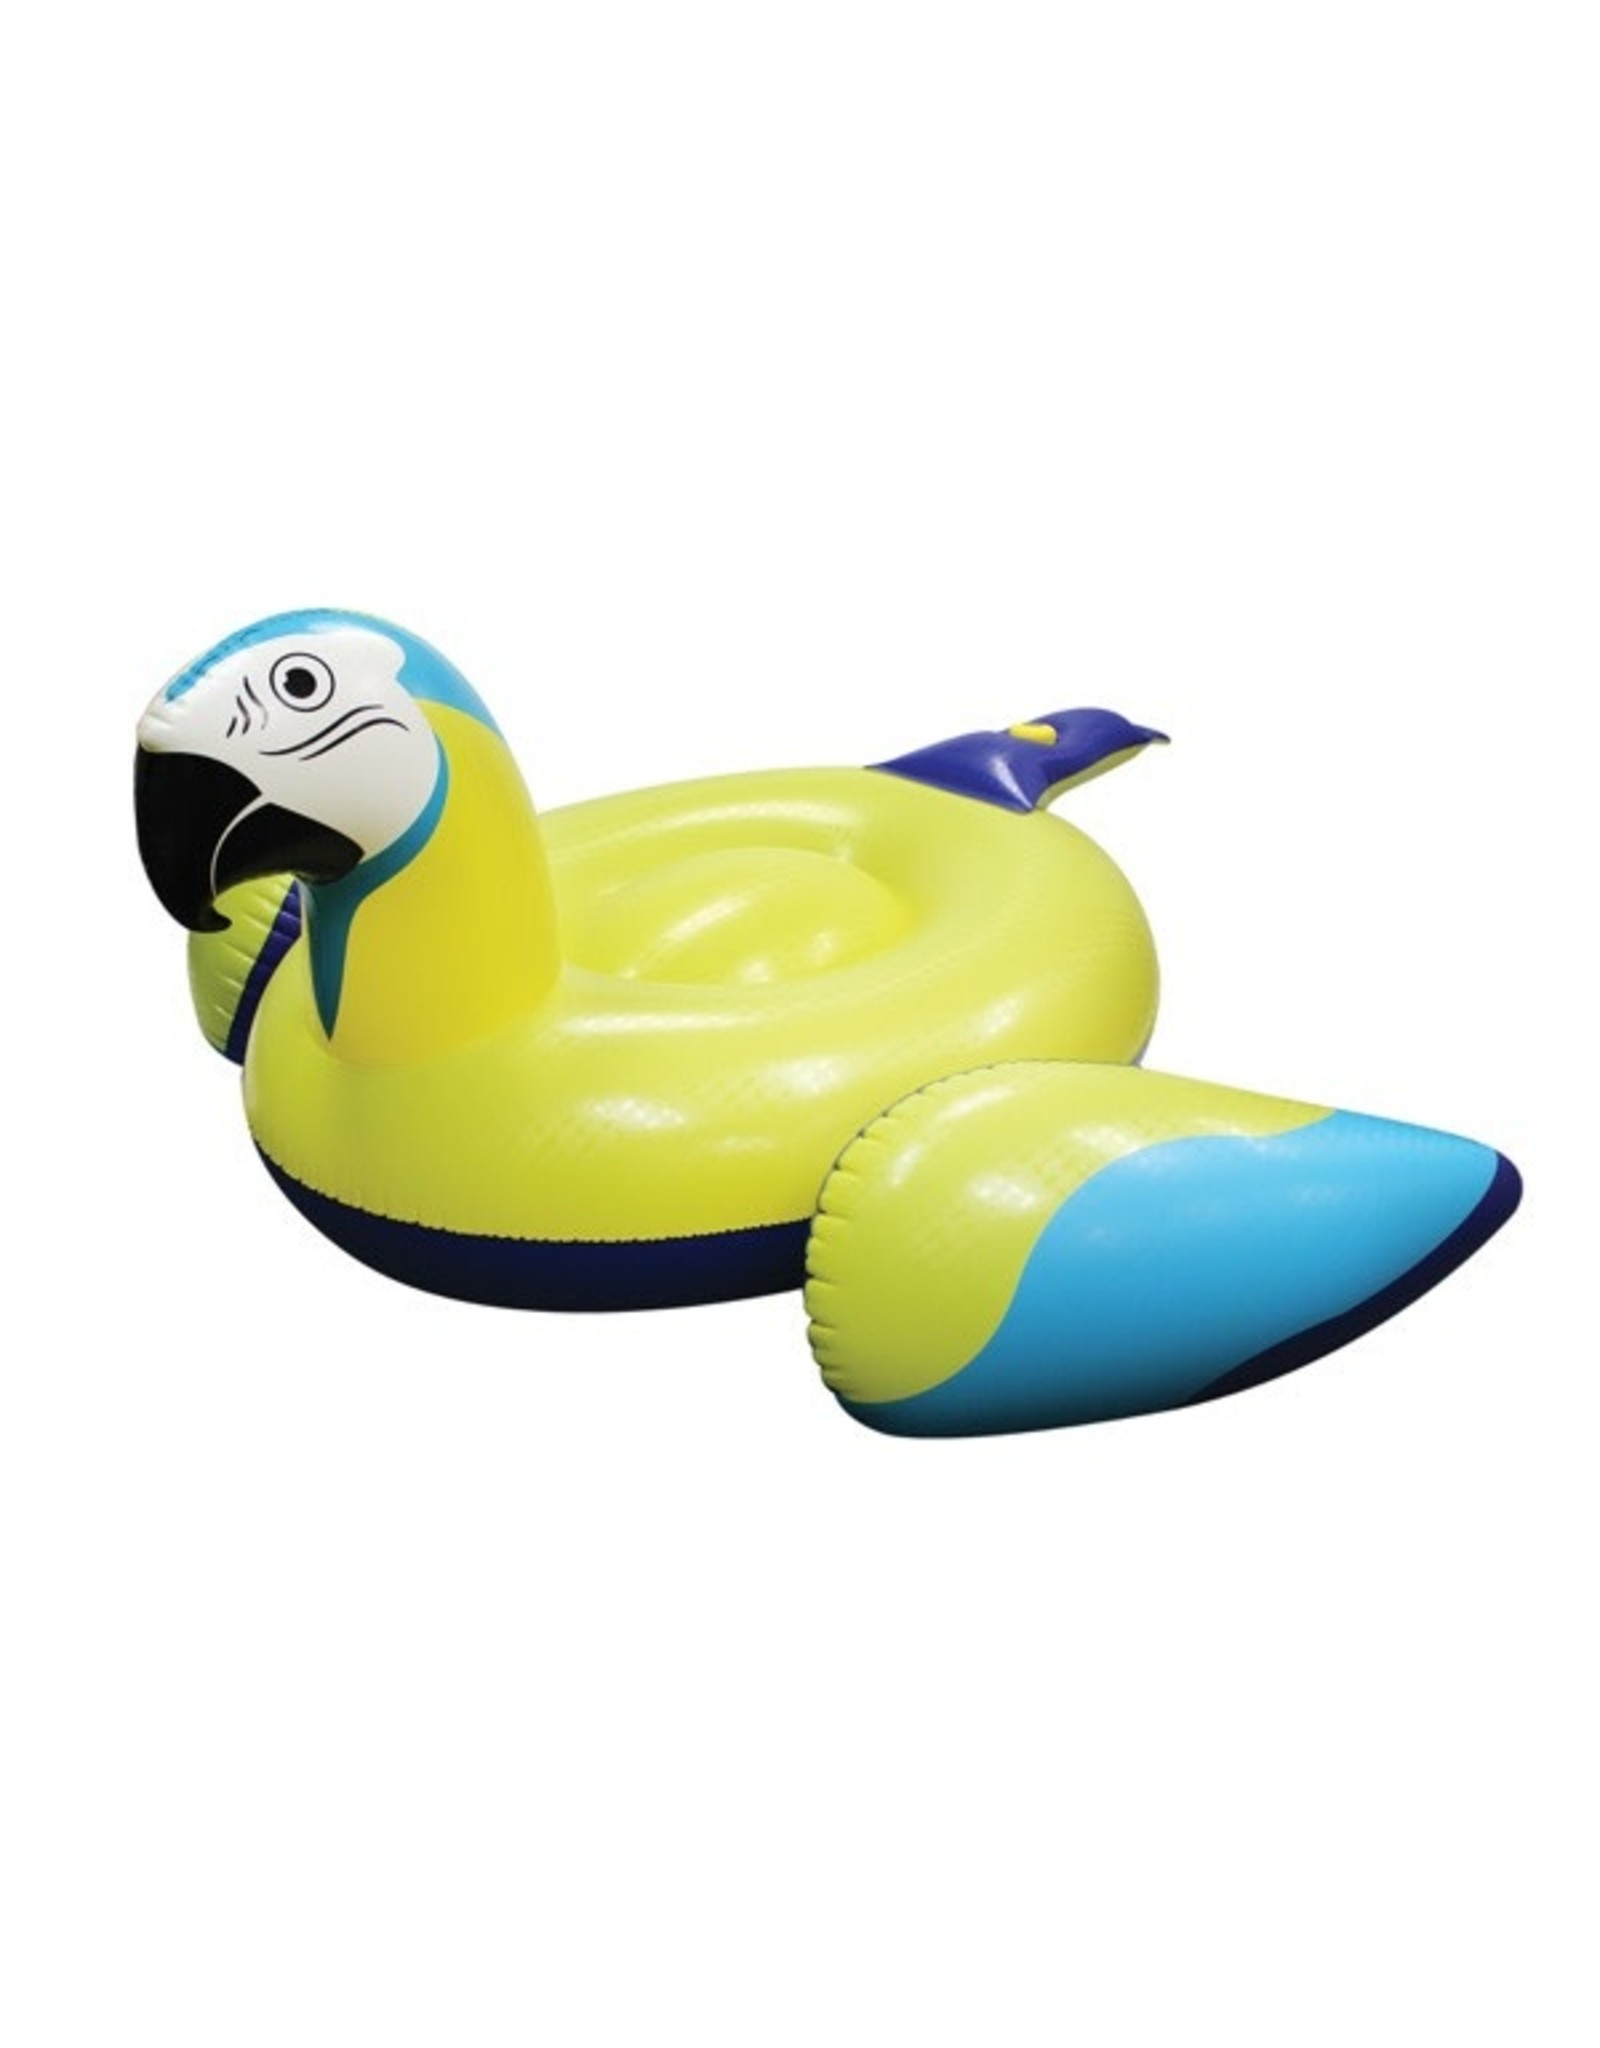 O'Brien Margaritaville Parrot Head Float